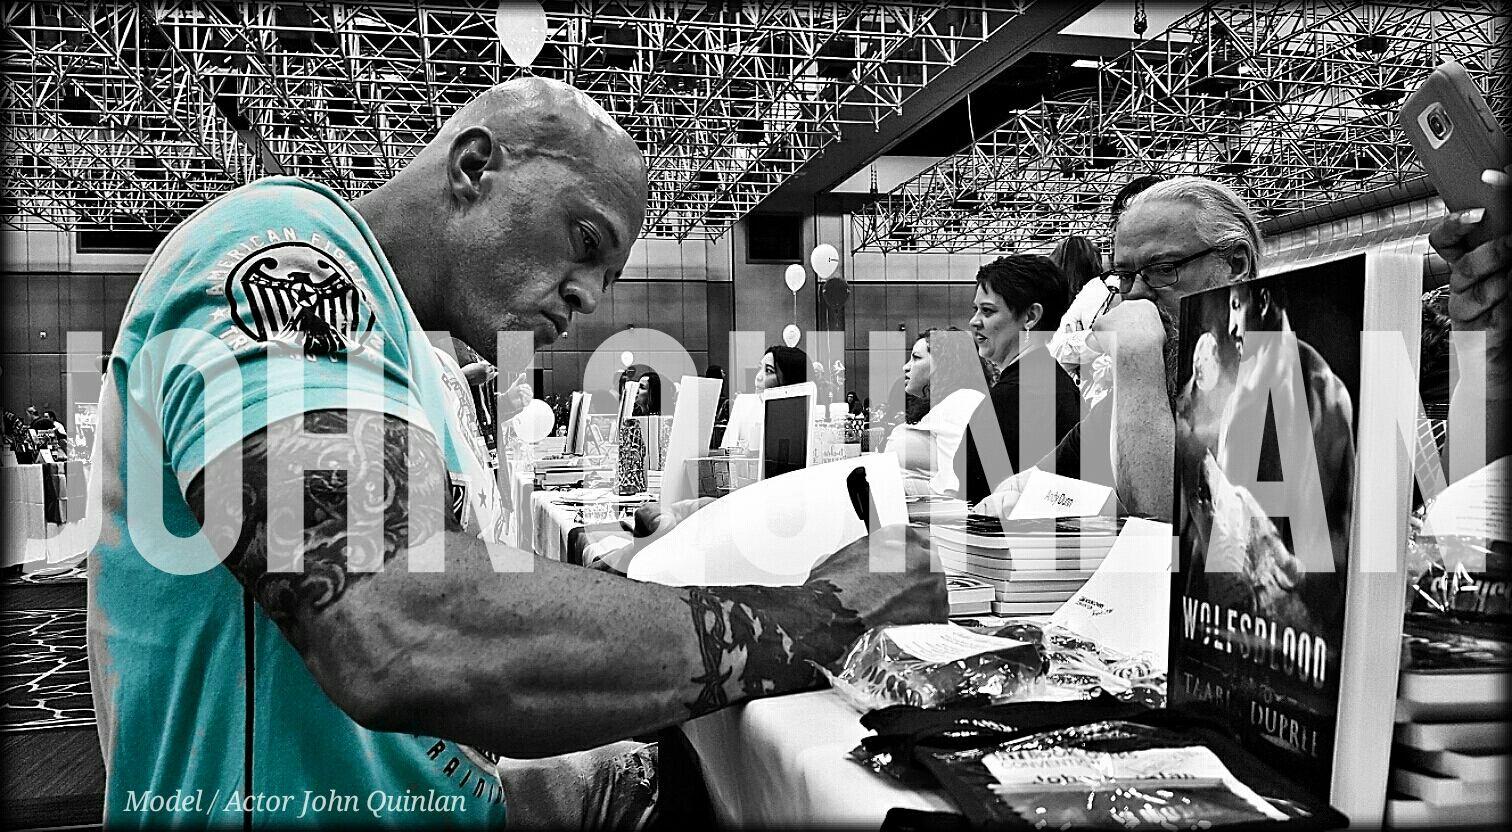 Model & Actor John Joseph Quinlan Las Vegas Autograph Signing #JohnQuinlan